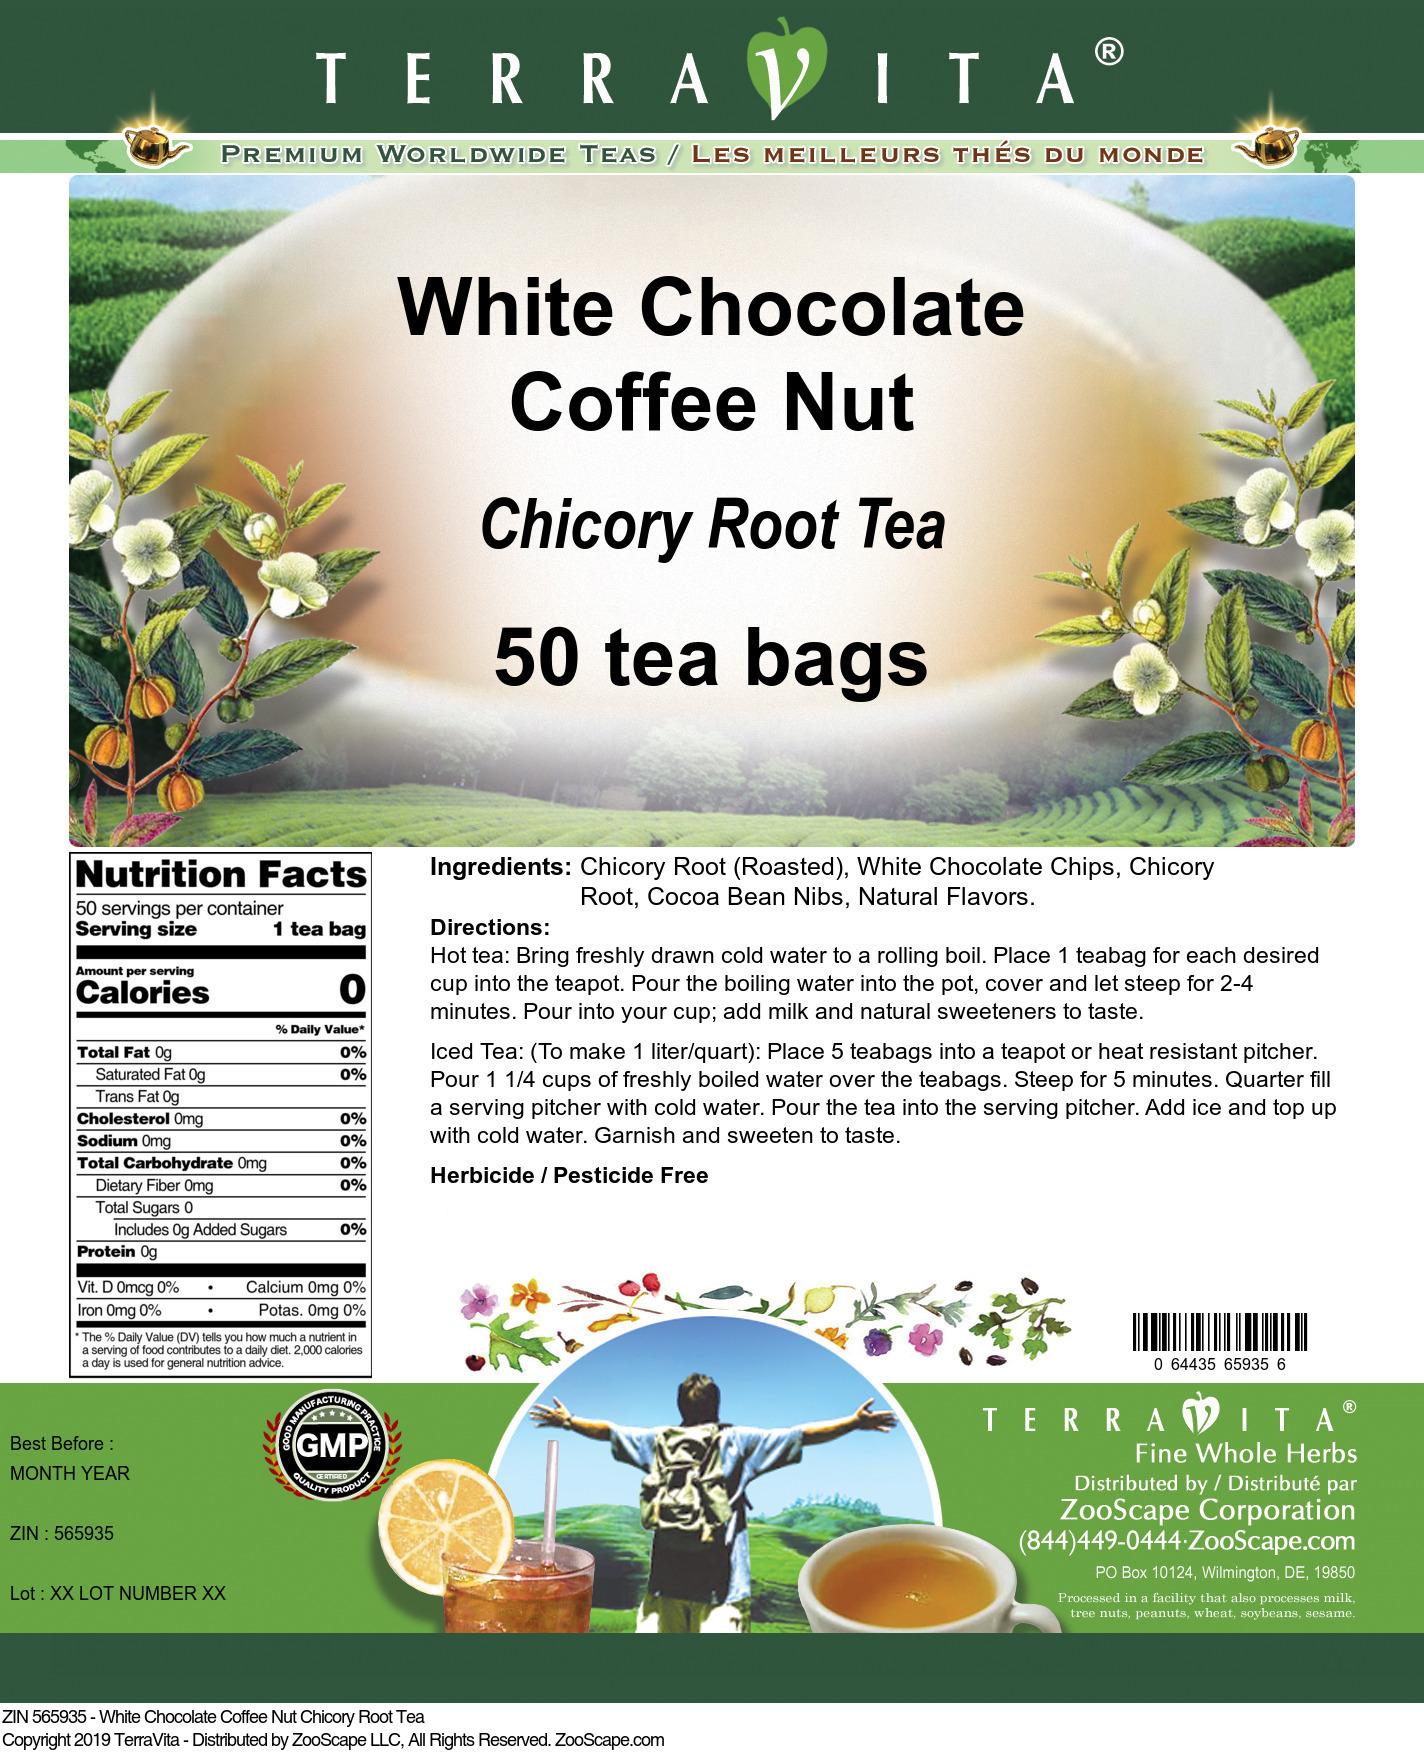 White Chocolate Coffee Nut Chicory Root Tea